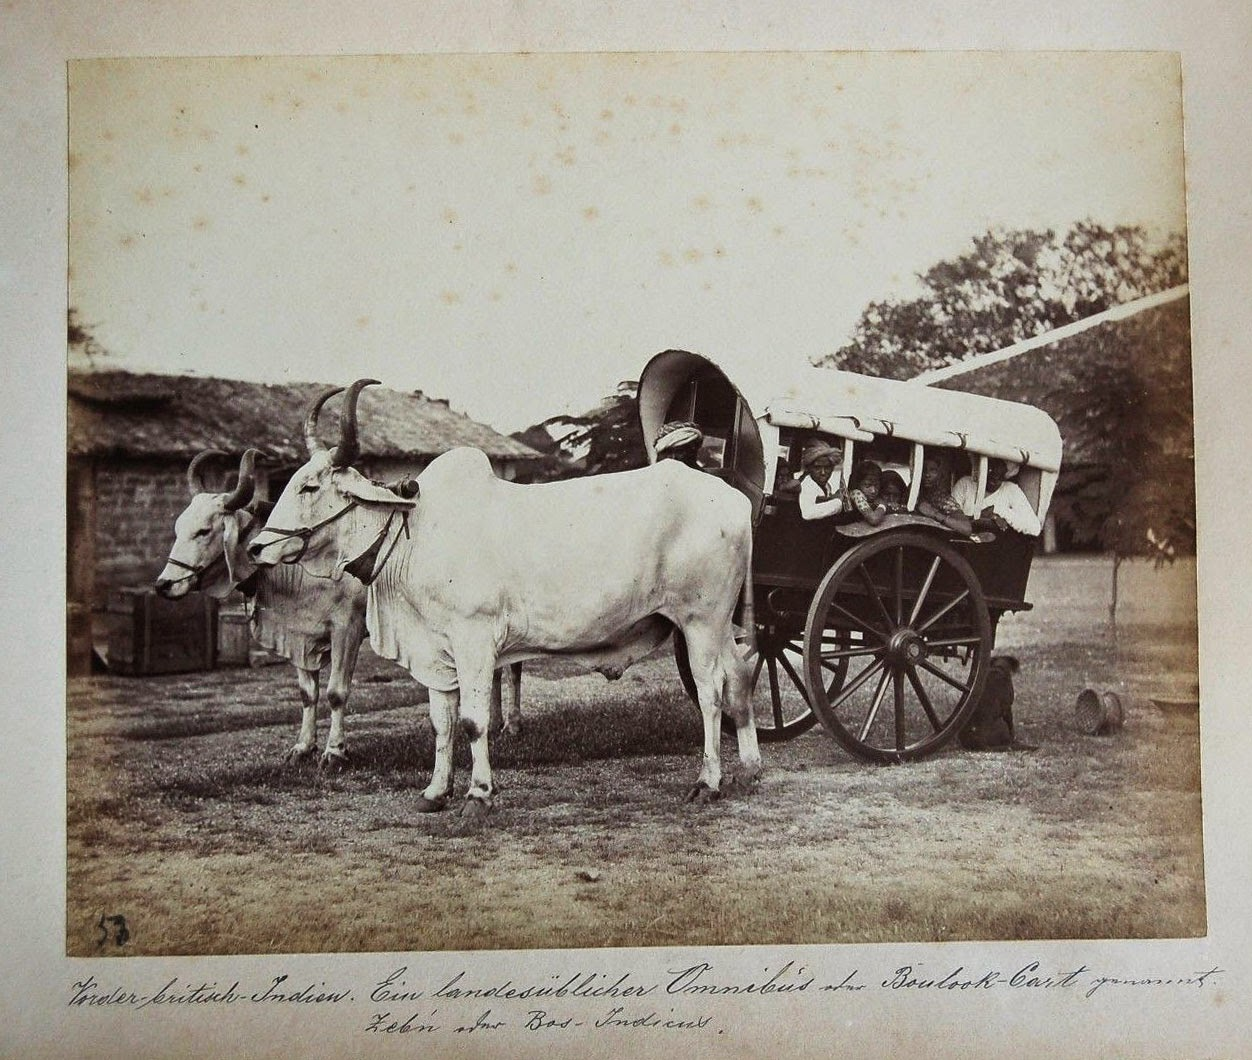 Indian Bullock Cart with Passengers